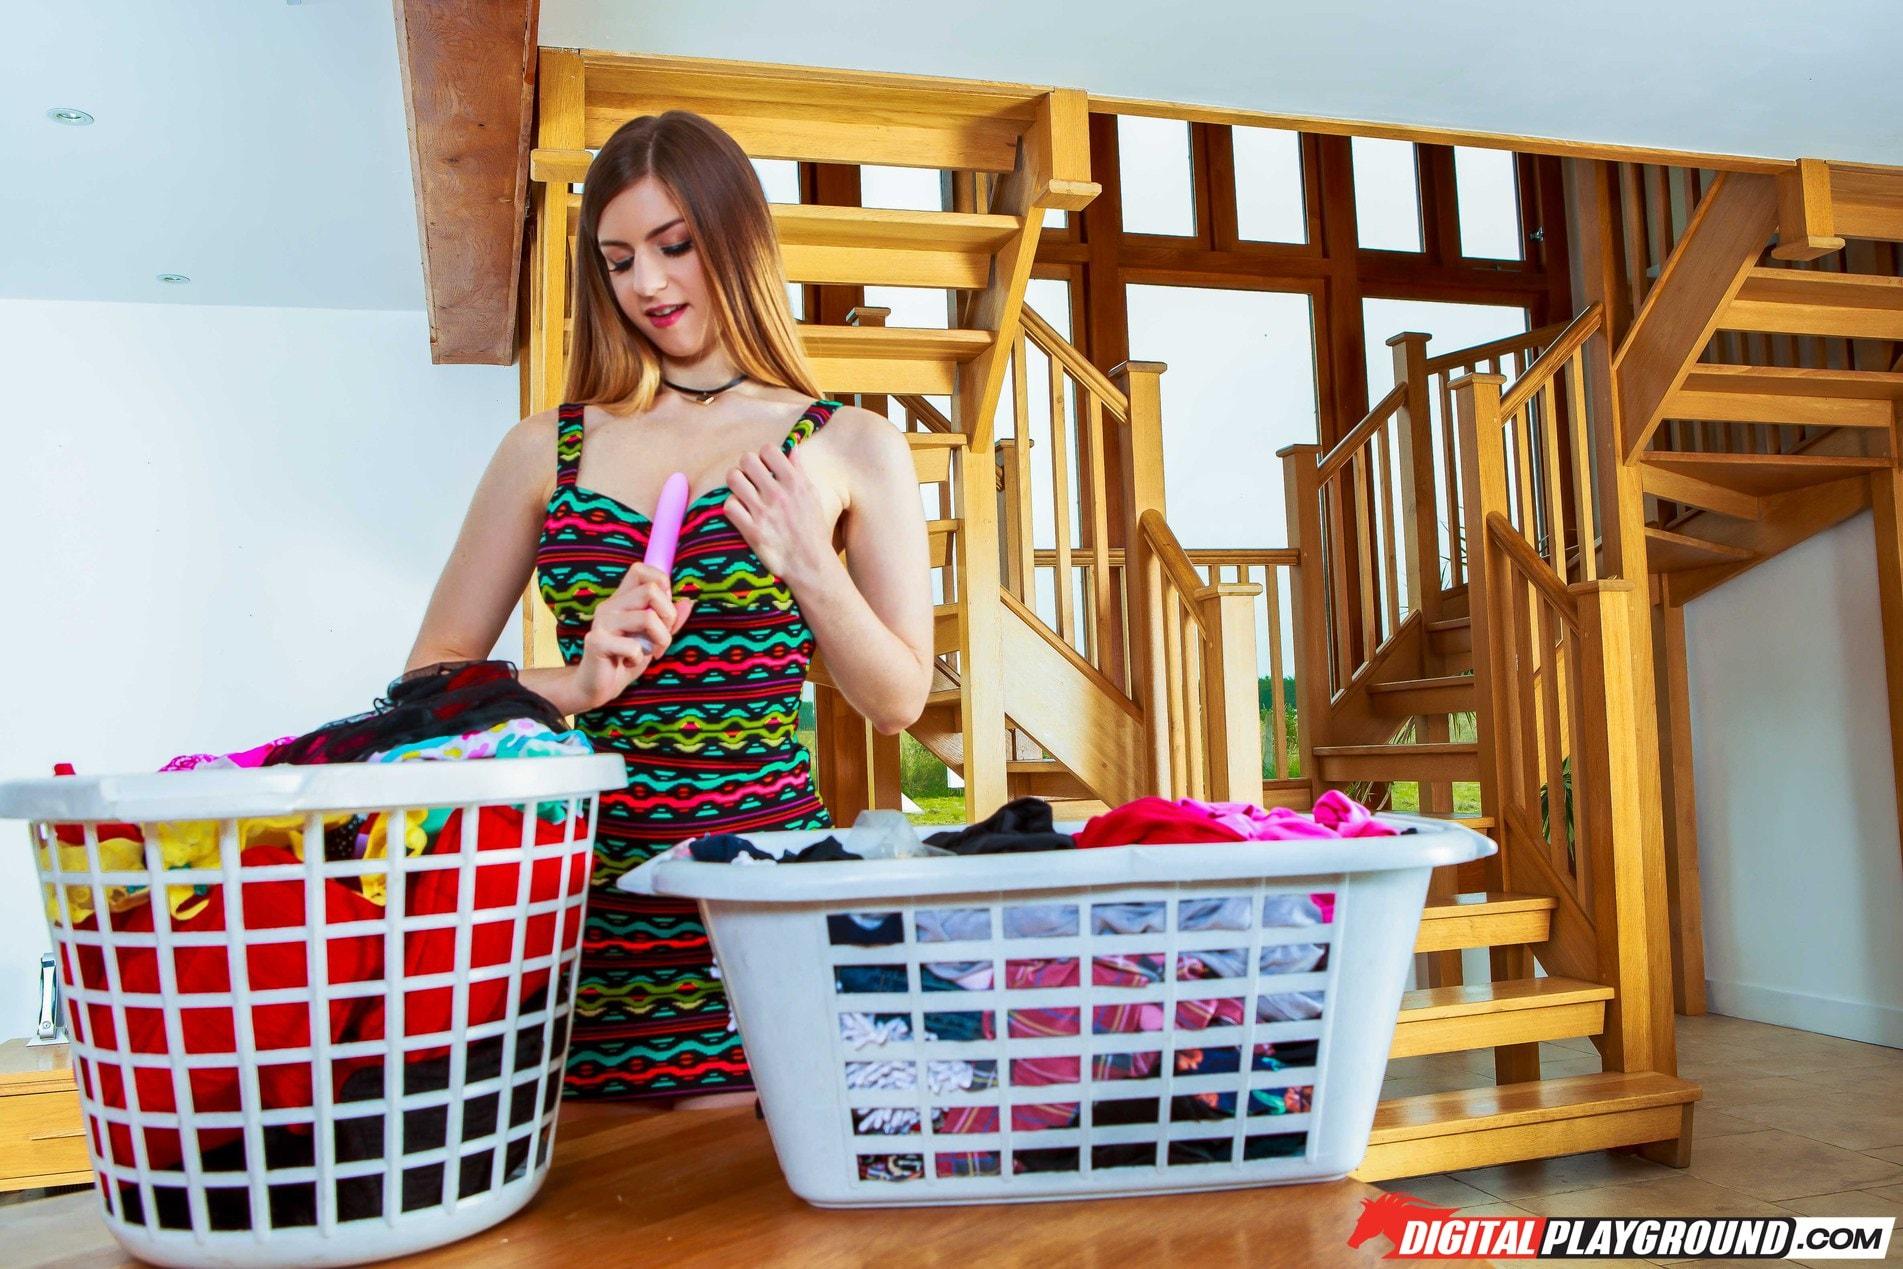 Digital Playground 'Eva's Dirty Laundry' starring Eva Lovia (Photo 104)